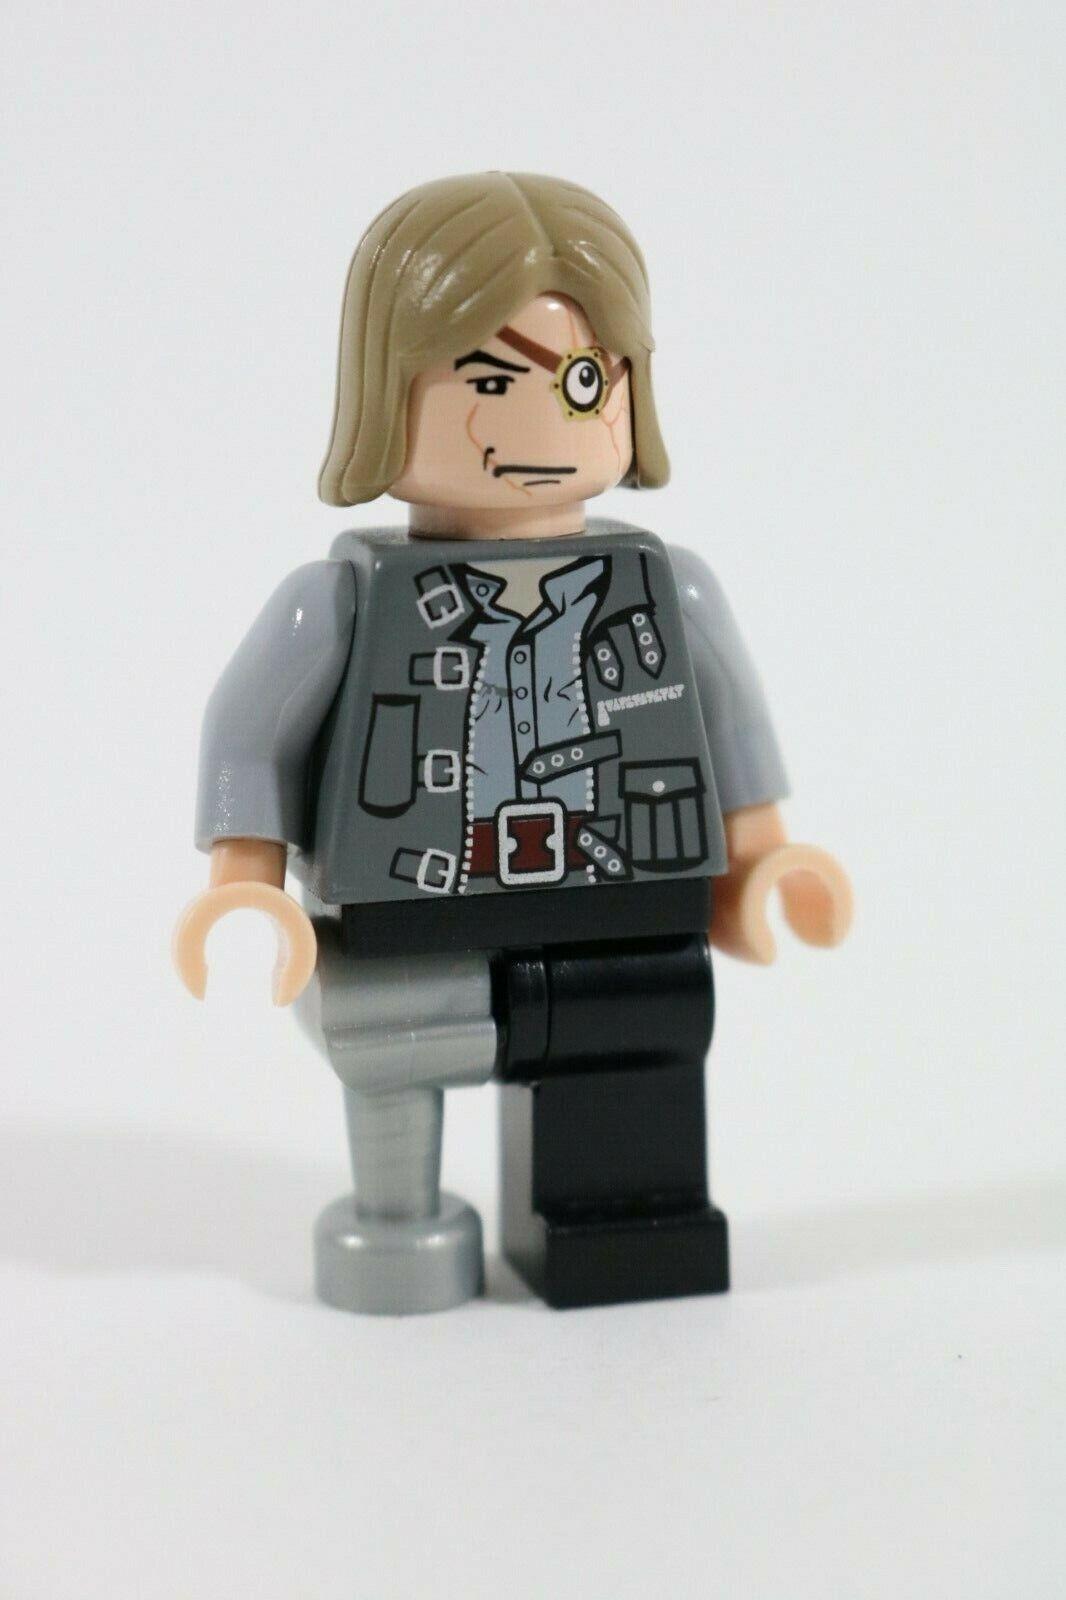 RARE LEGO HARRY POTTER Mad-Eye Moody figurine 4767 très bon état